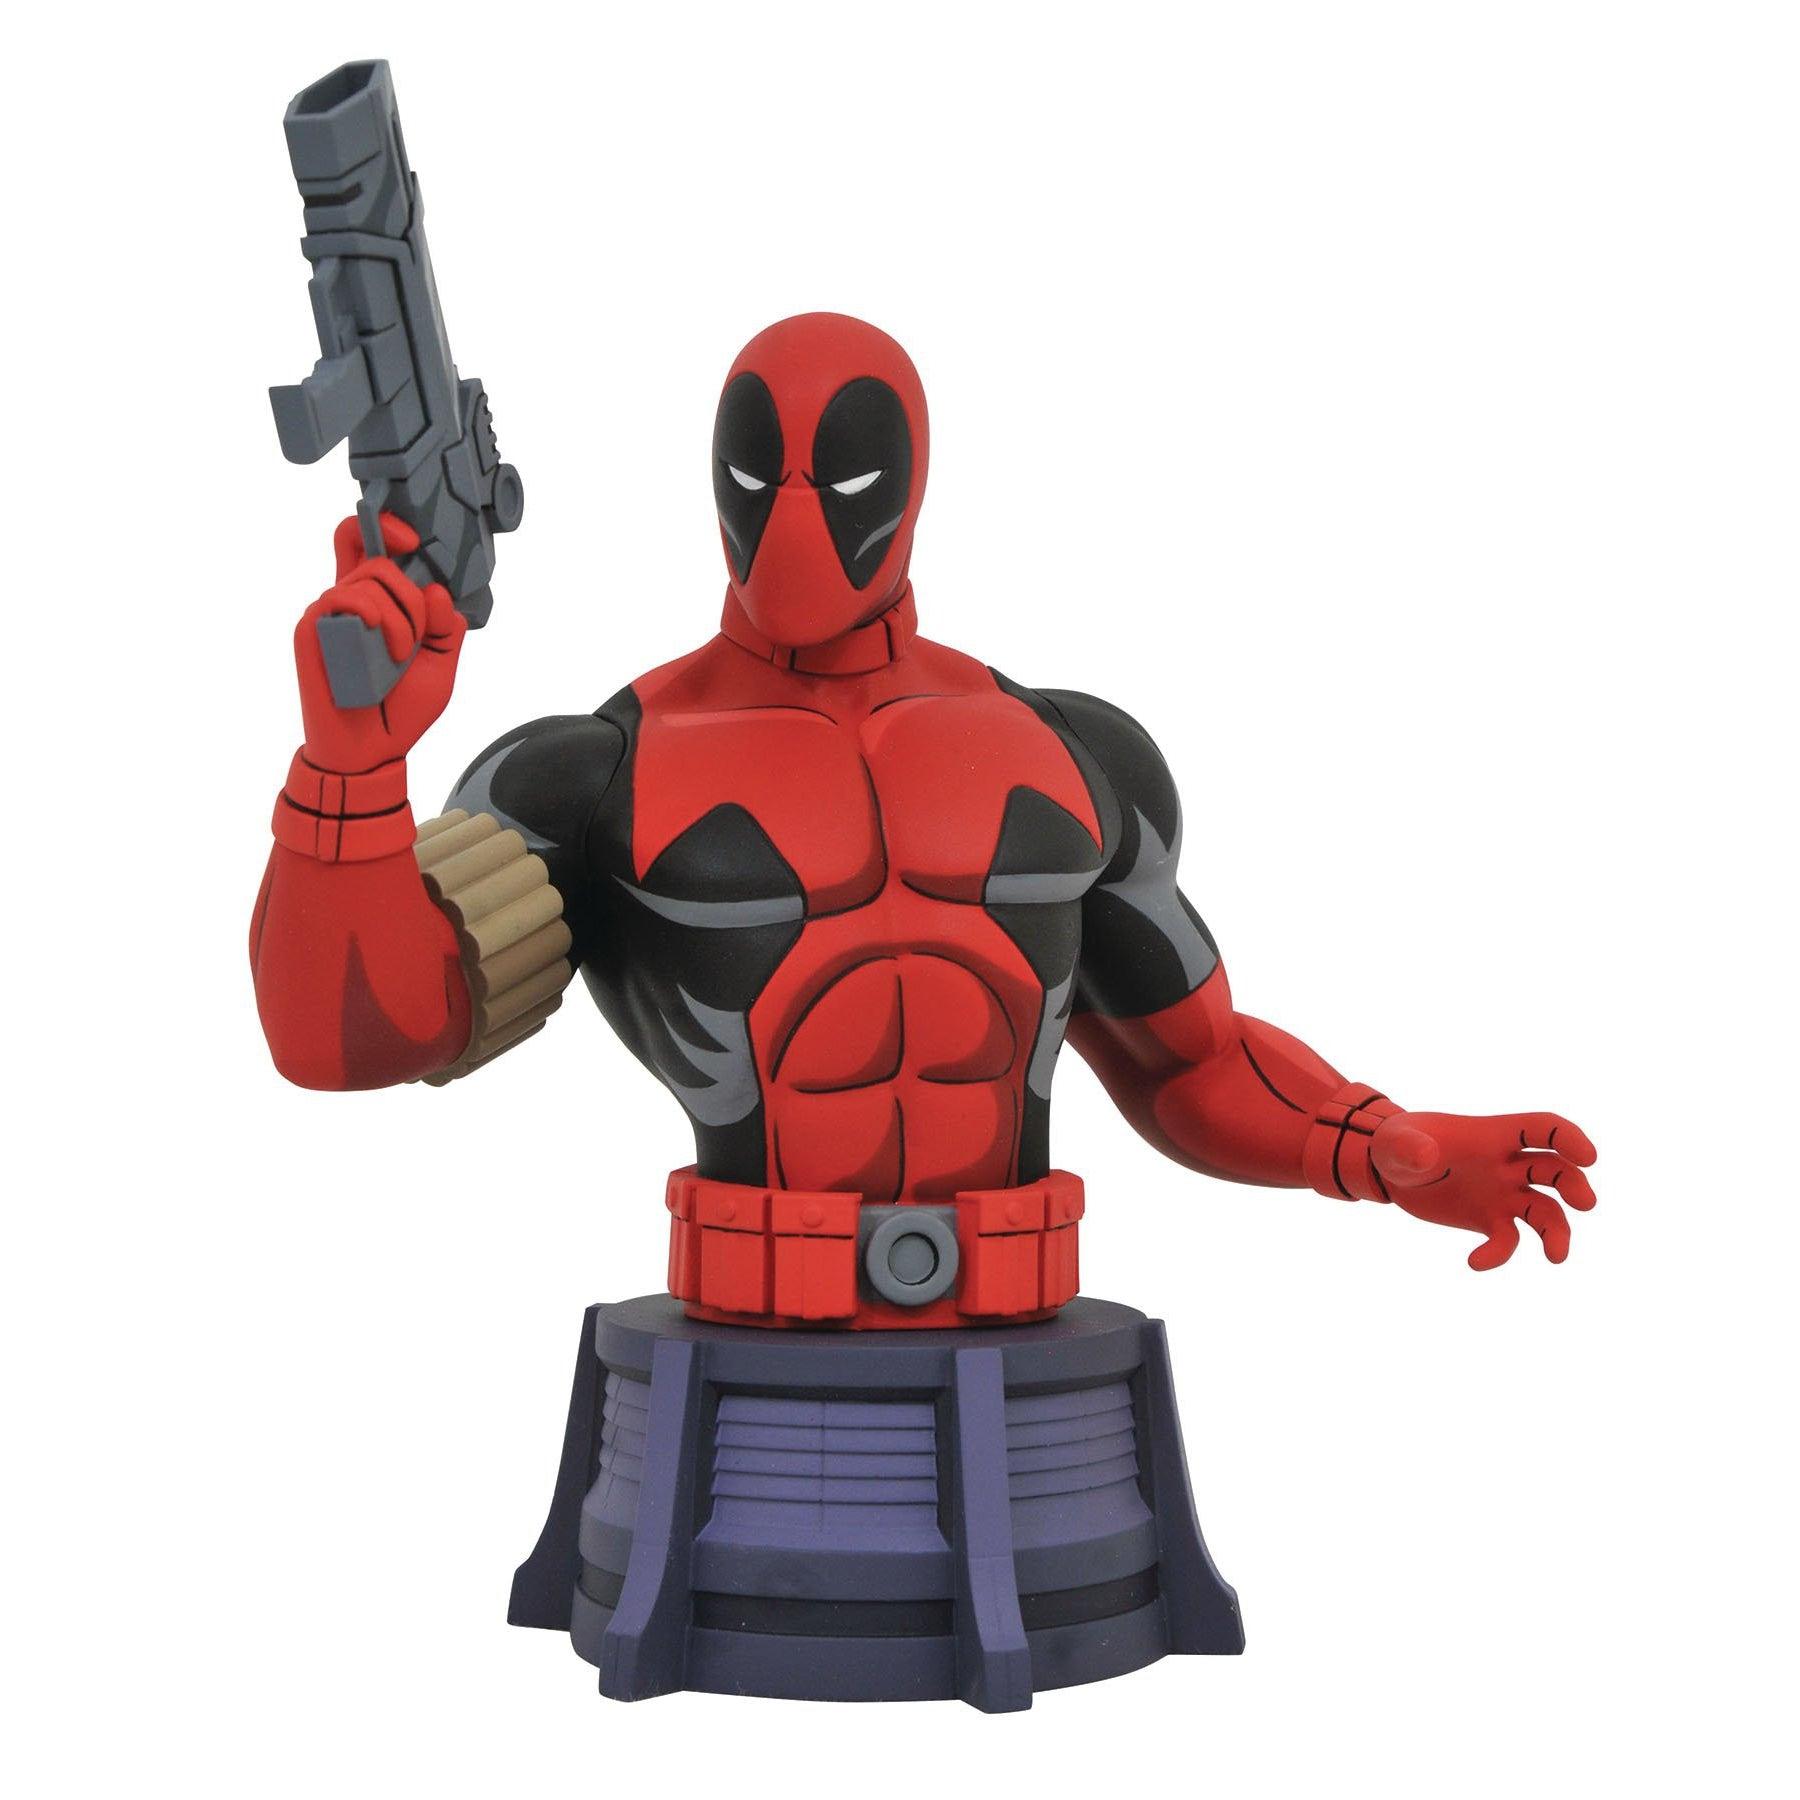 Image of Marvel Animated X-Men Deadpool Bust - JULY 2020